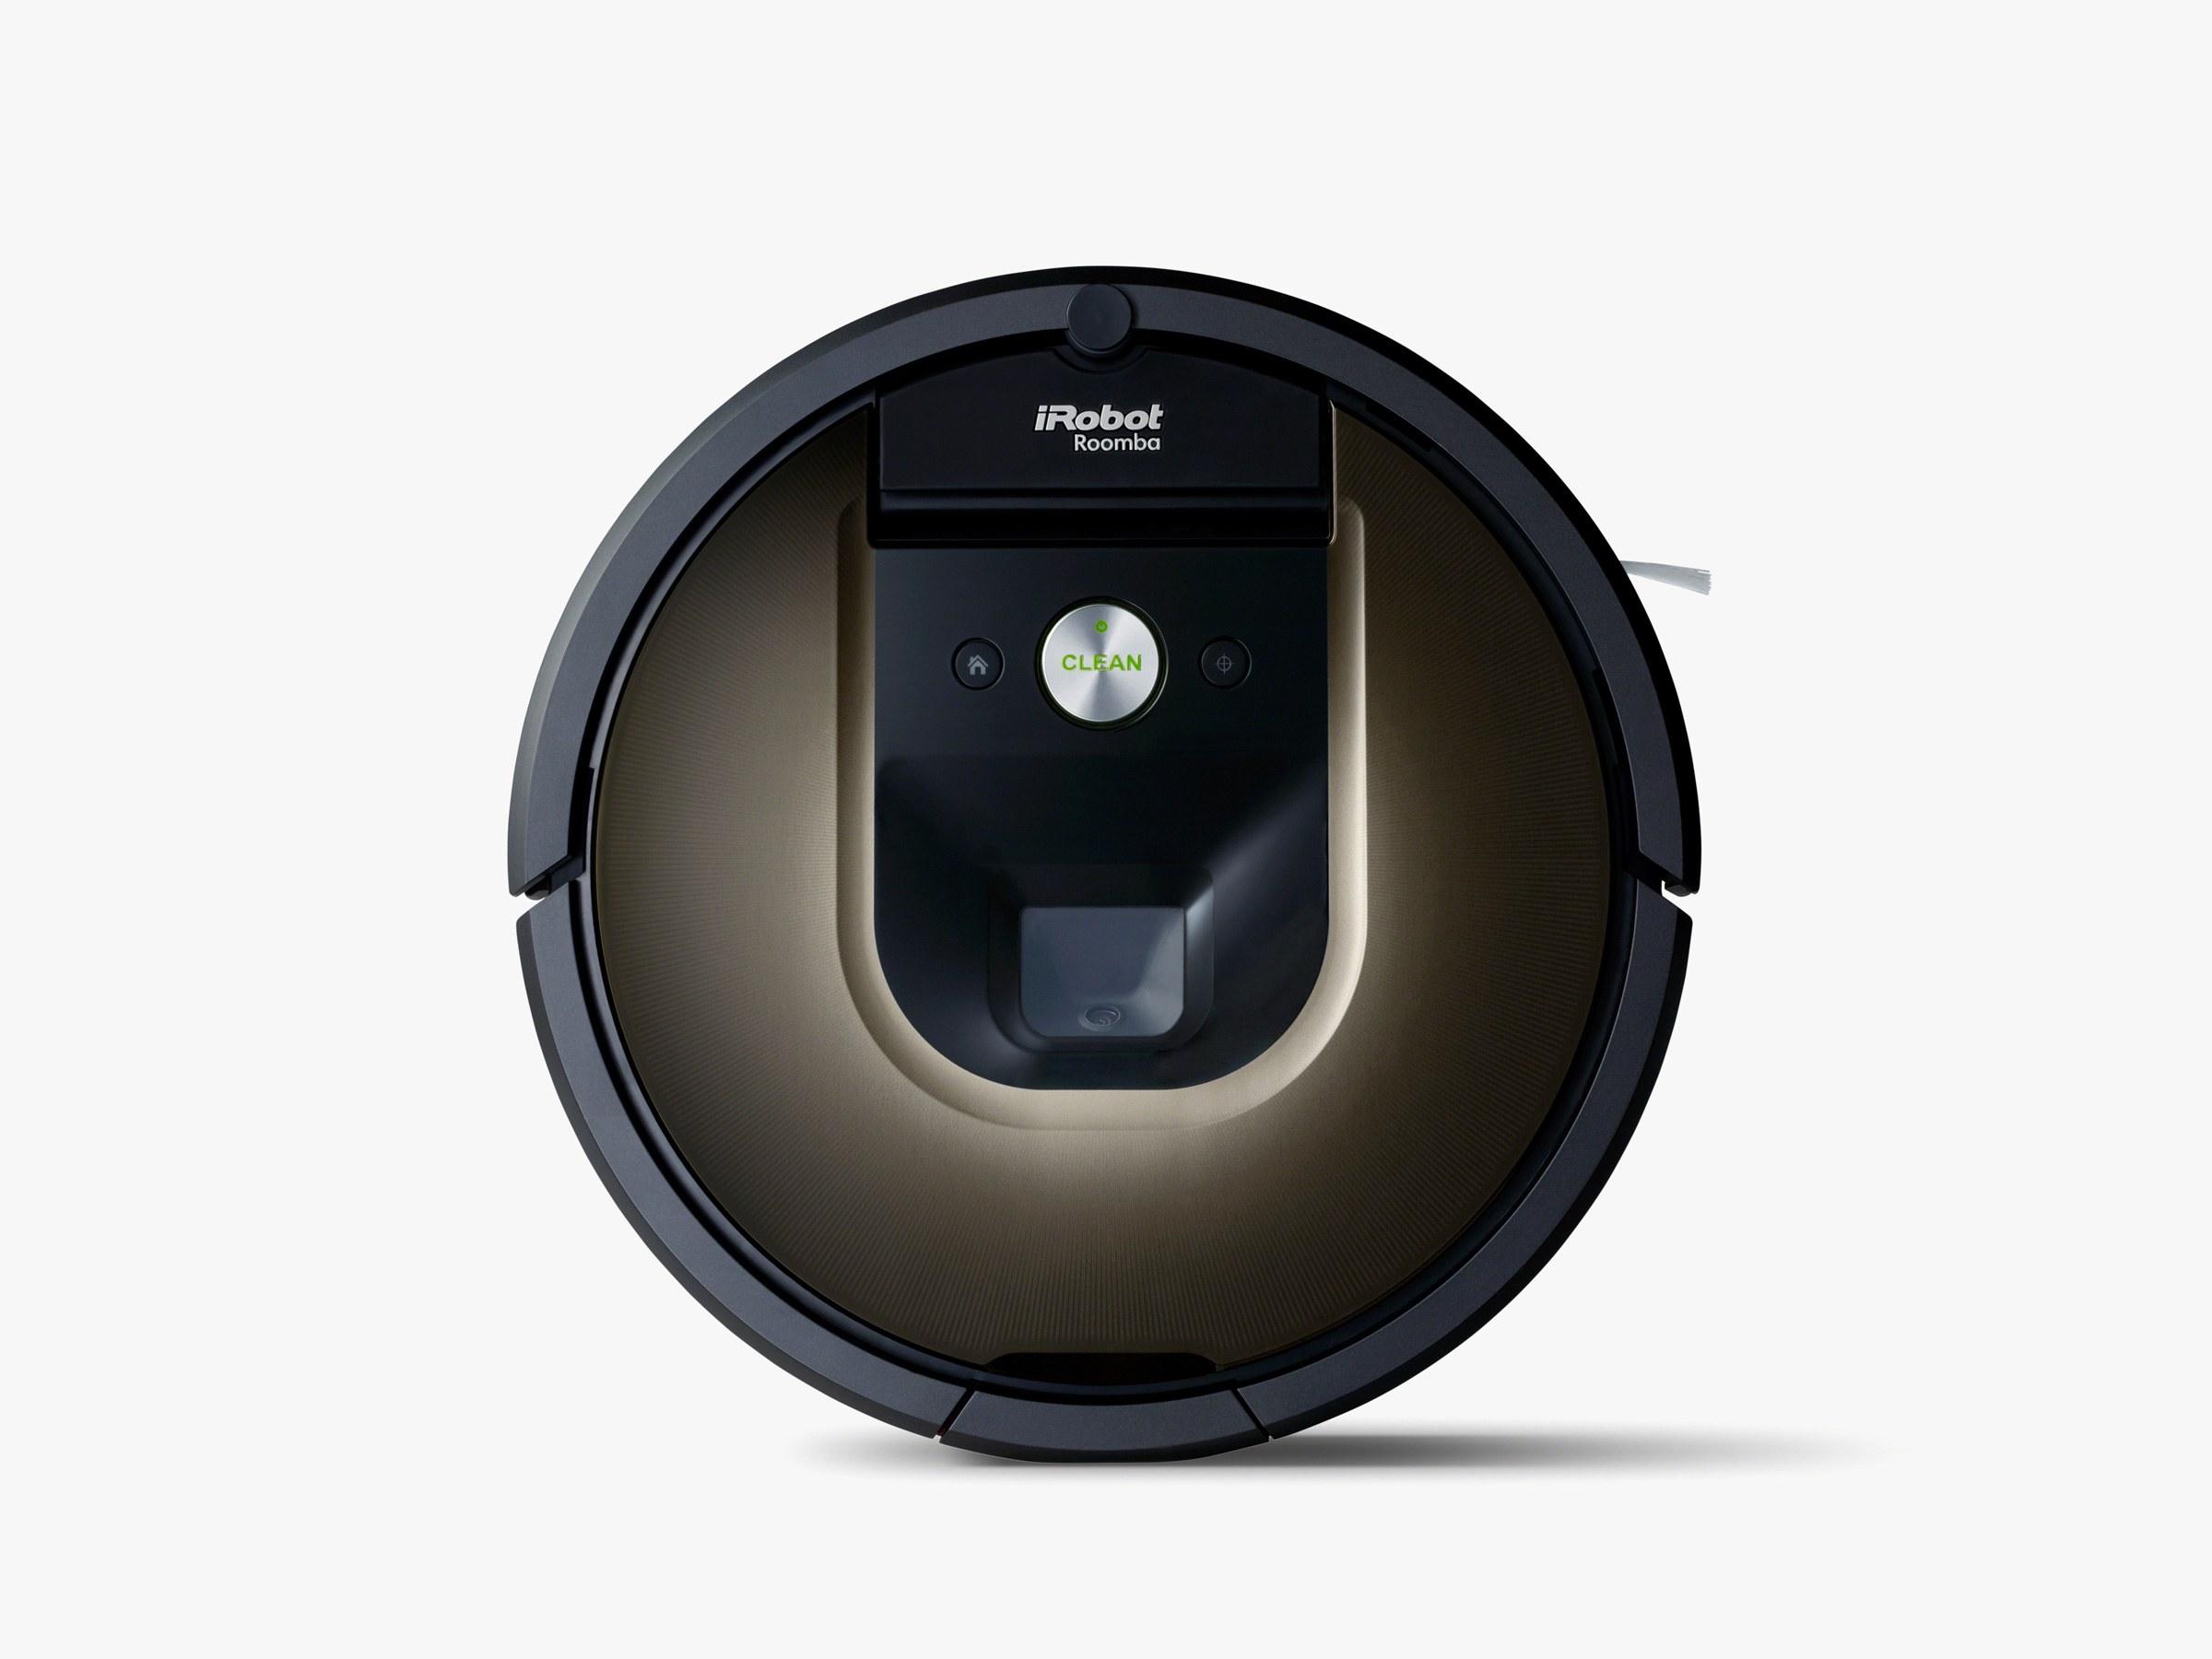 Woman calls 911 to find 'burglar' Roomba inside bathroom